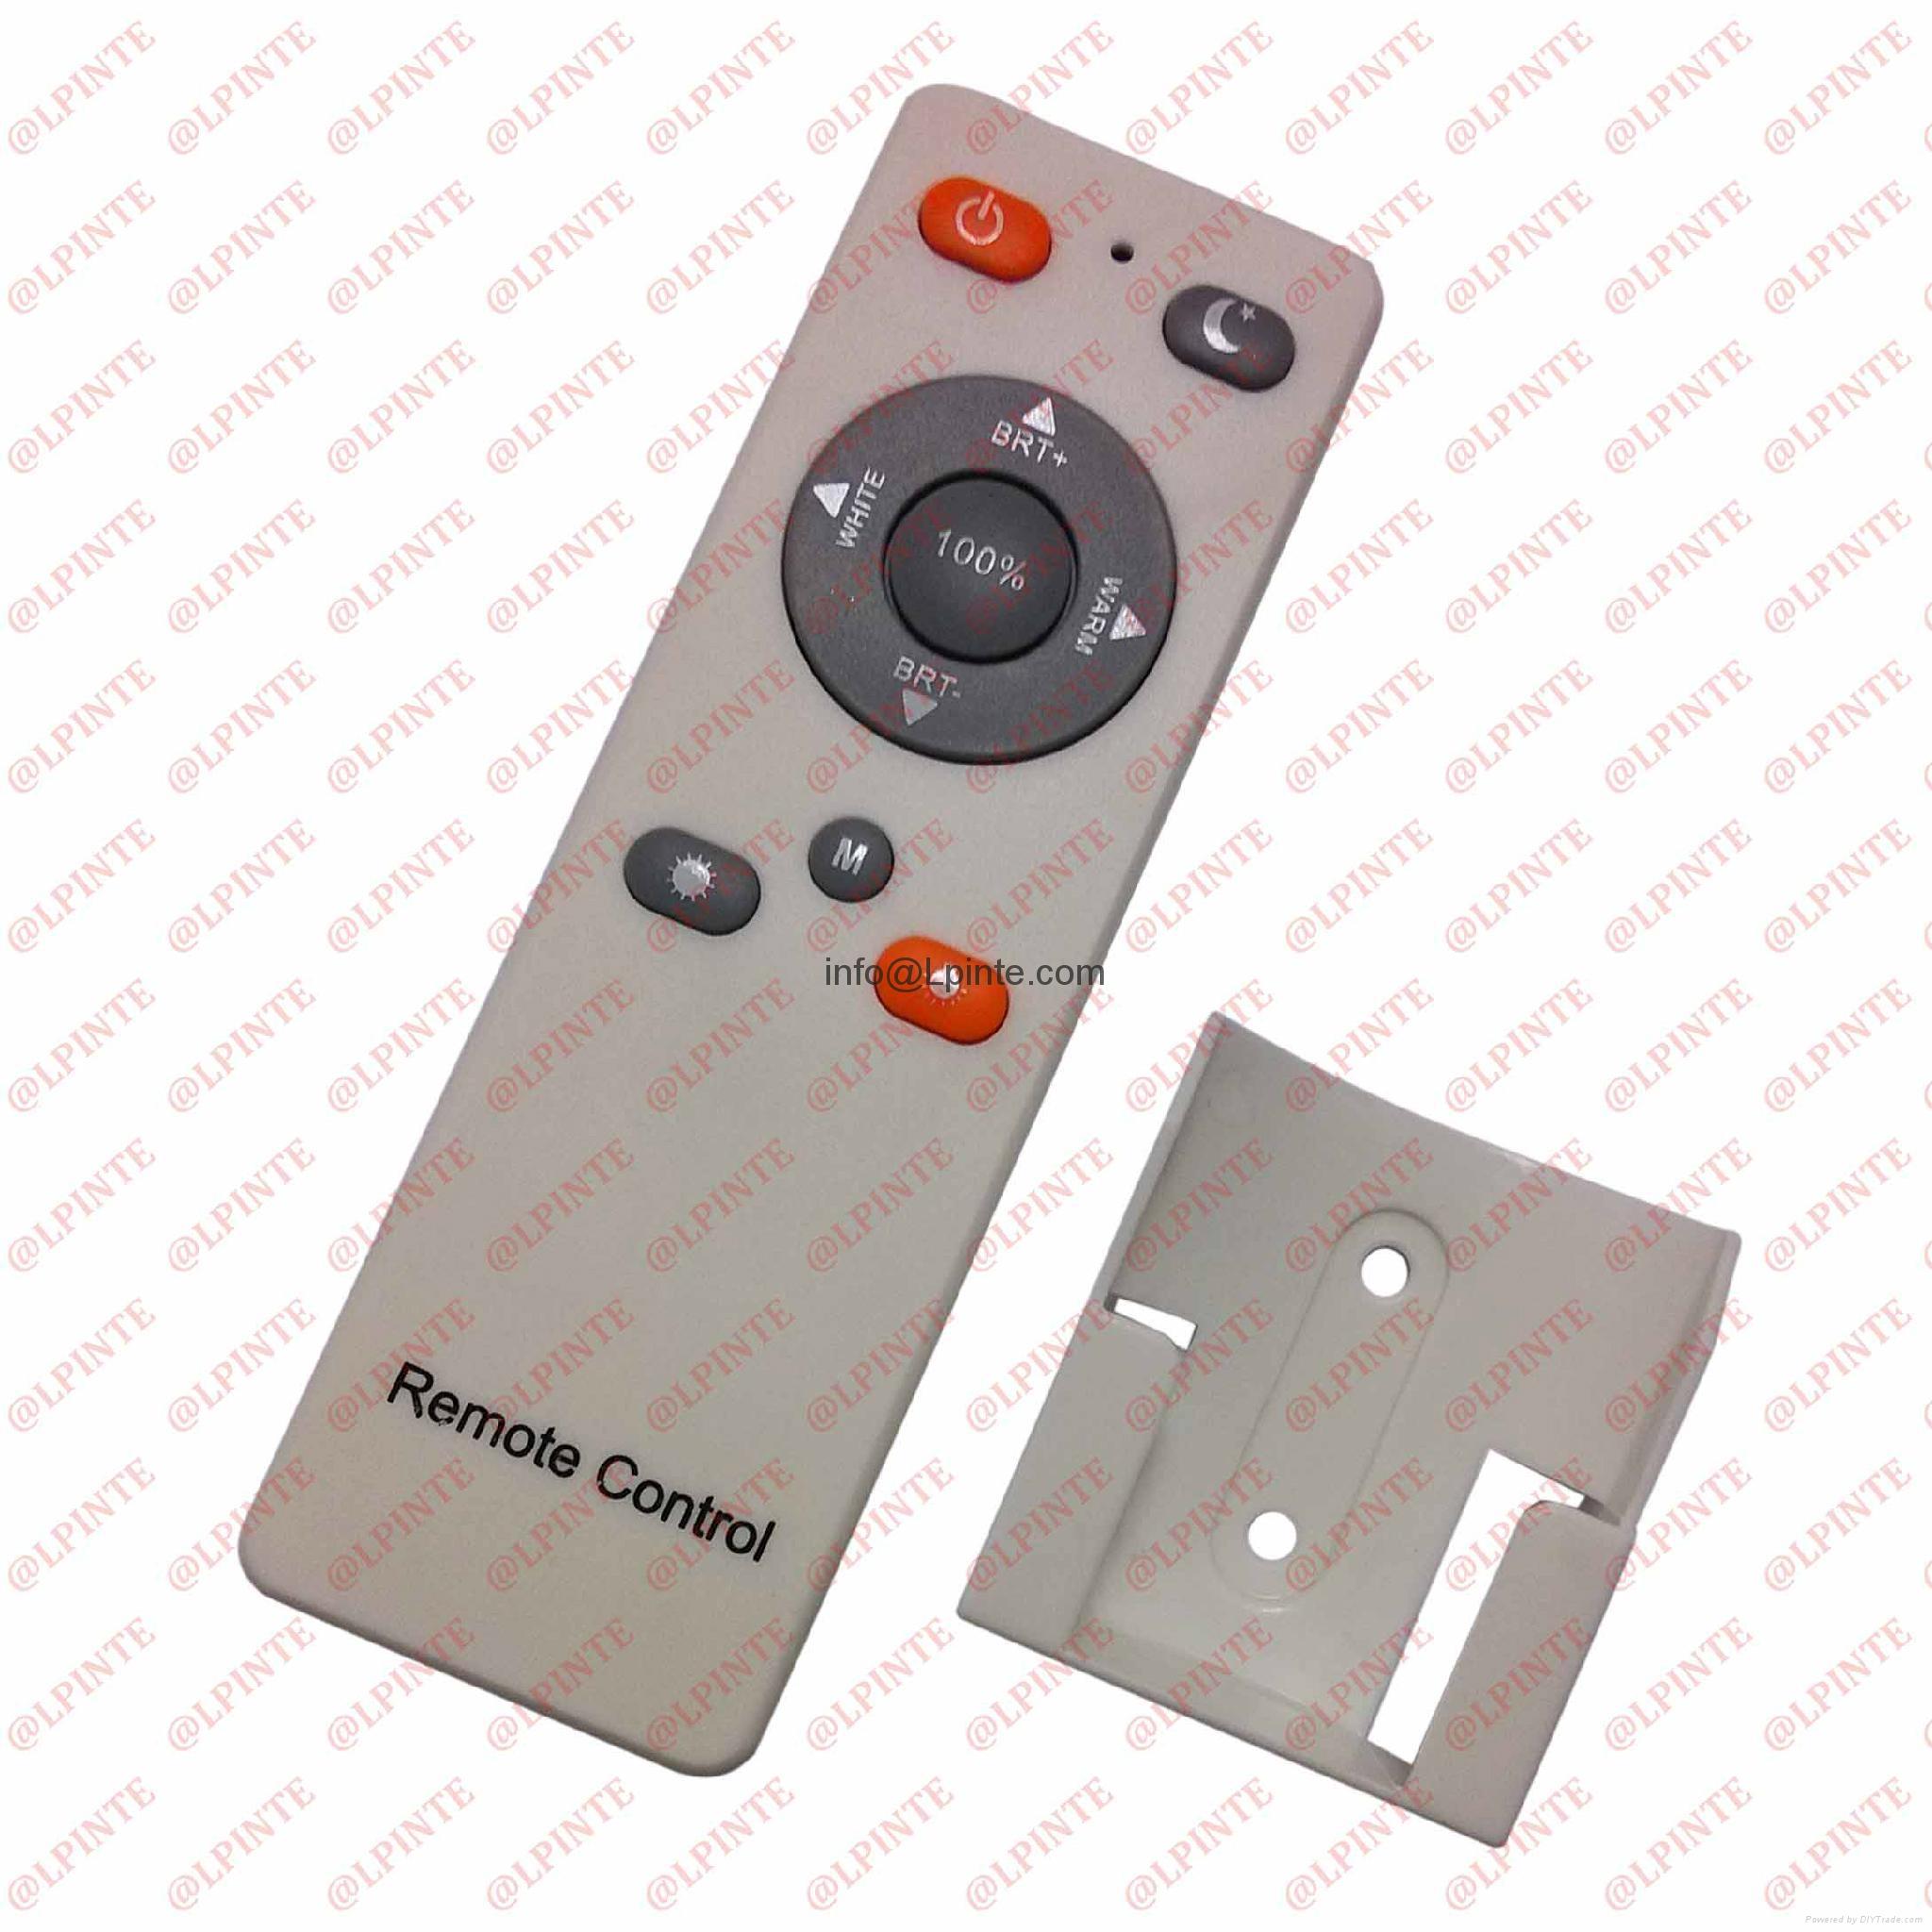 audio media tv remote control 10 keys rubber botton with holder LPI-R10B